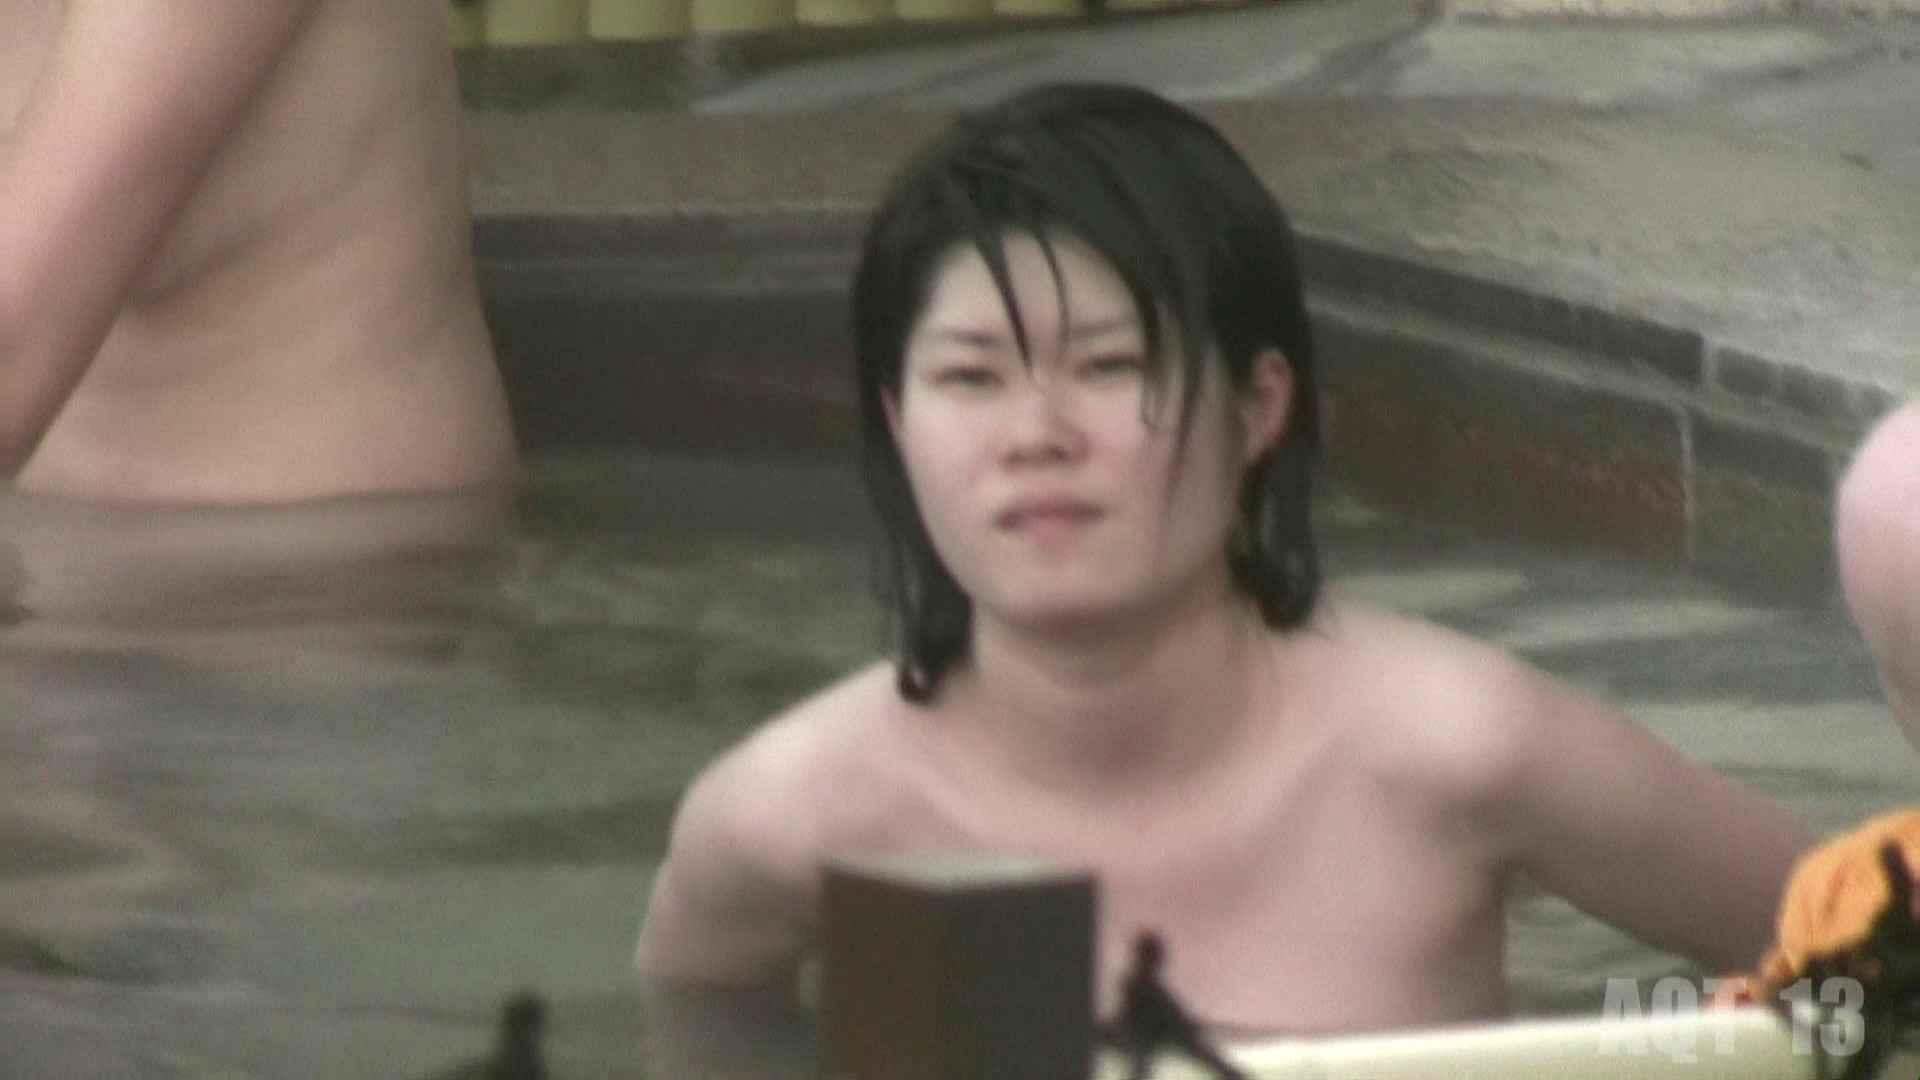 Aquaな露天風呂Vol.813 OLのプライベート  11pic 6